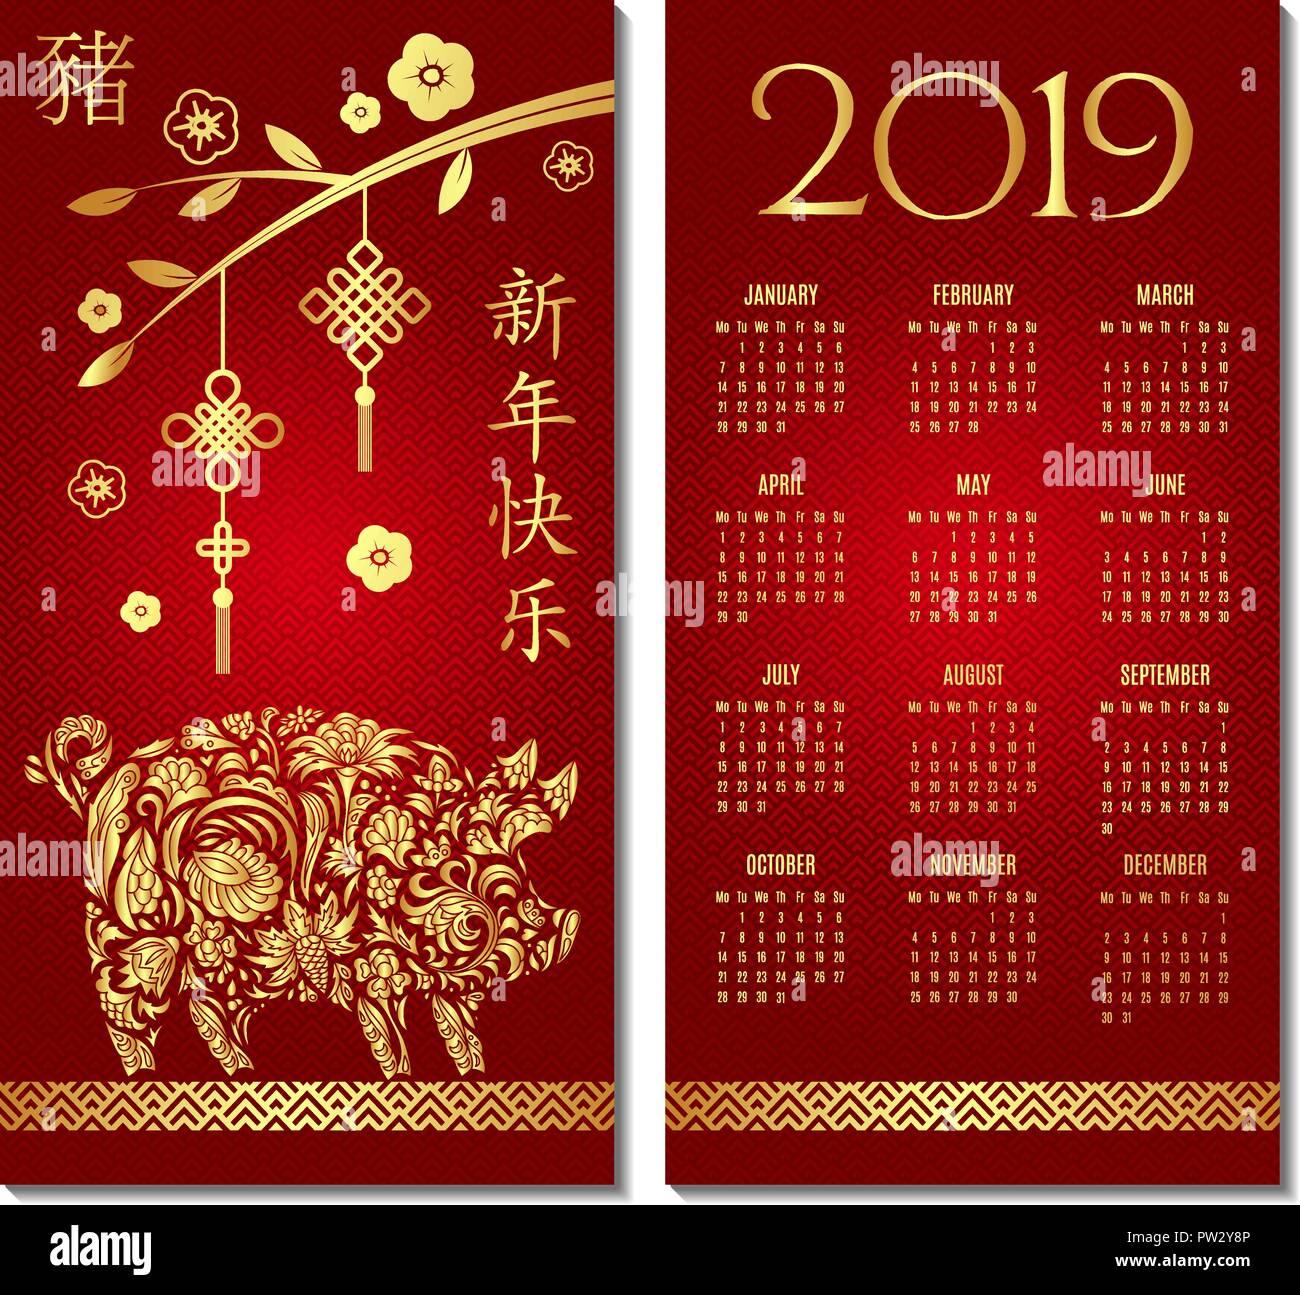 Calendrier Traduction.Calendrier 2019 Bonne Annee Nouvel An Chinois Bonjour